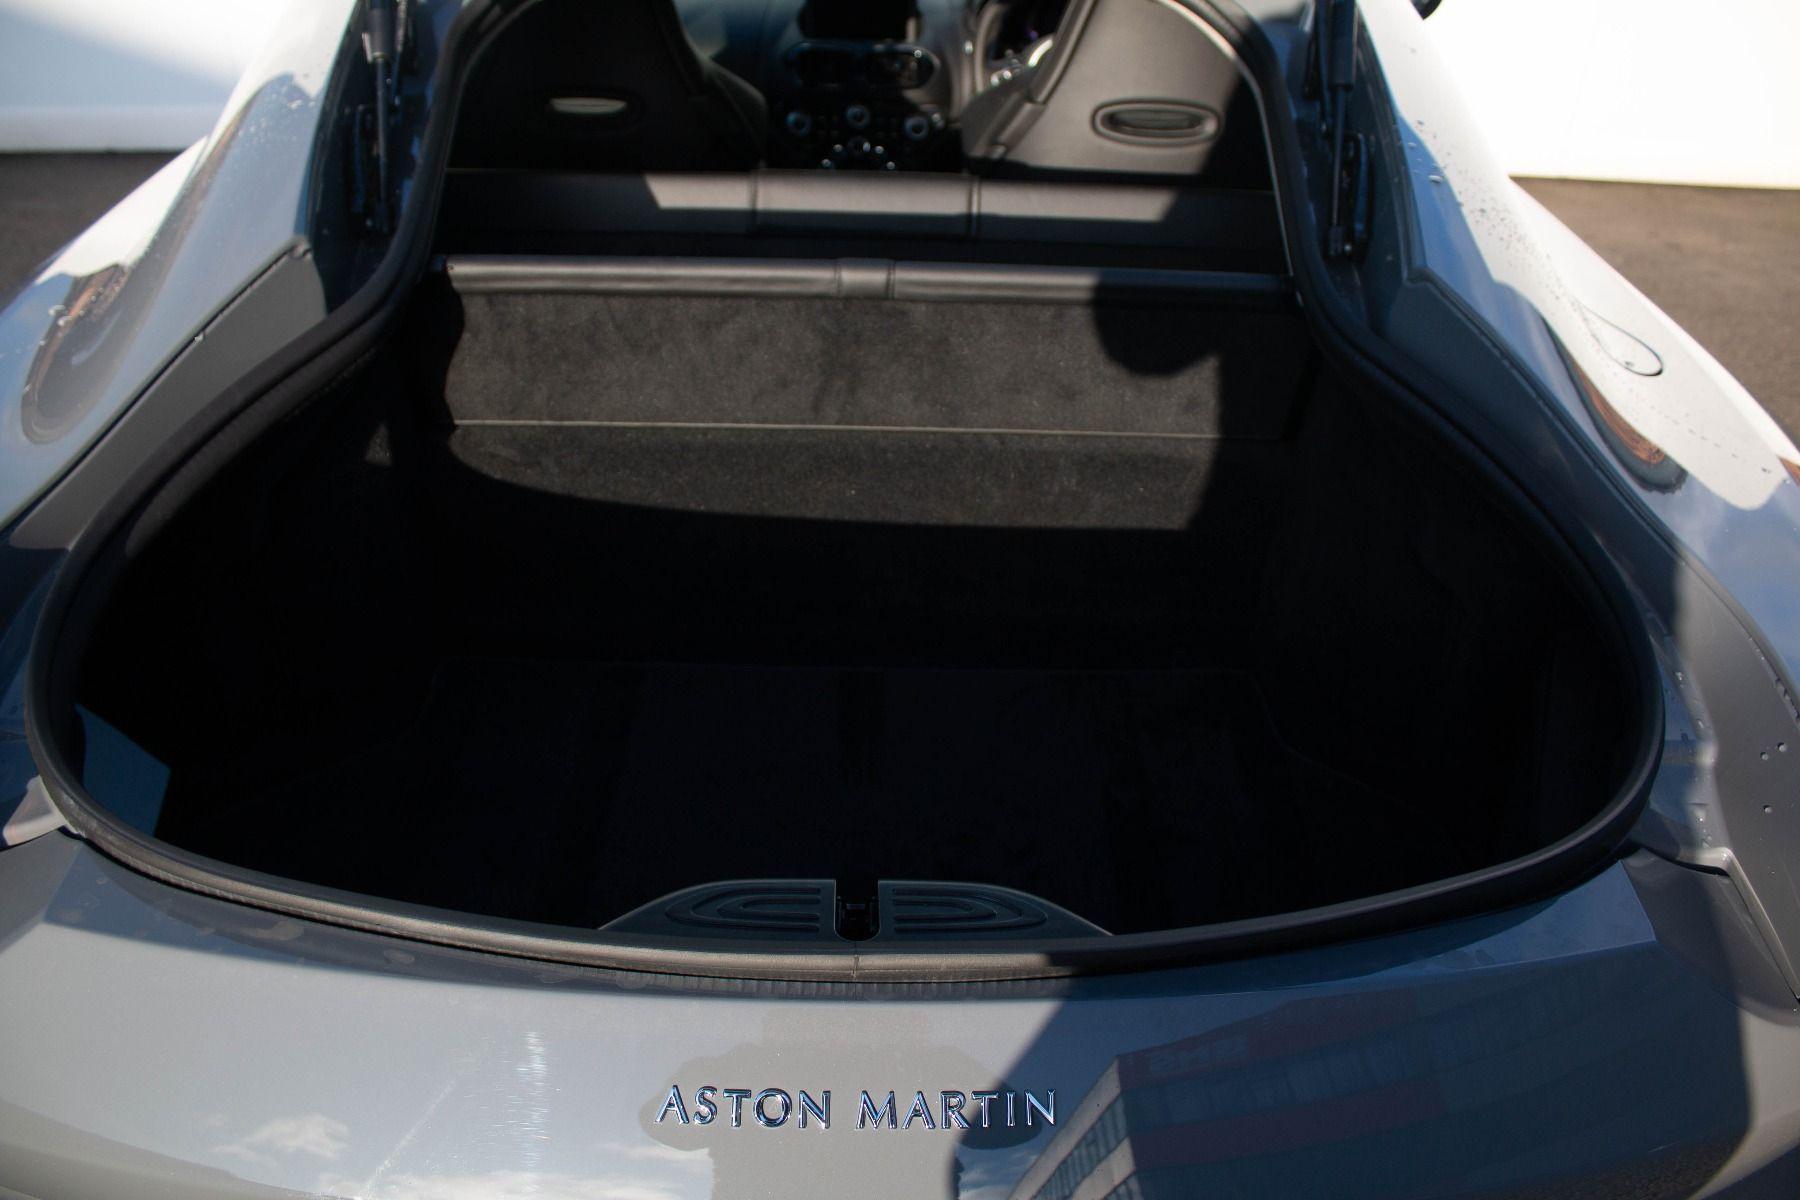 Aston Martin V8 Vantage Coupe 2dr ZF 8 Speed image 10